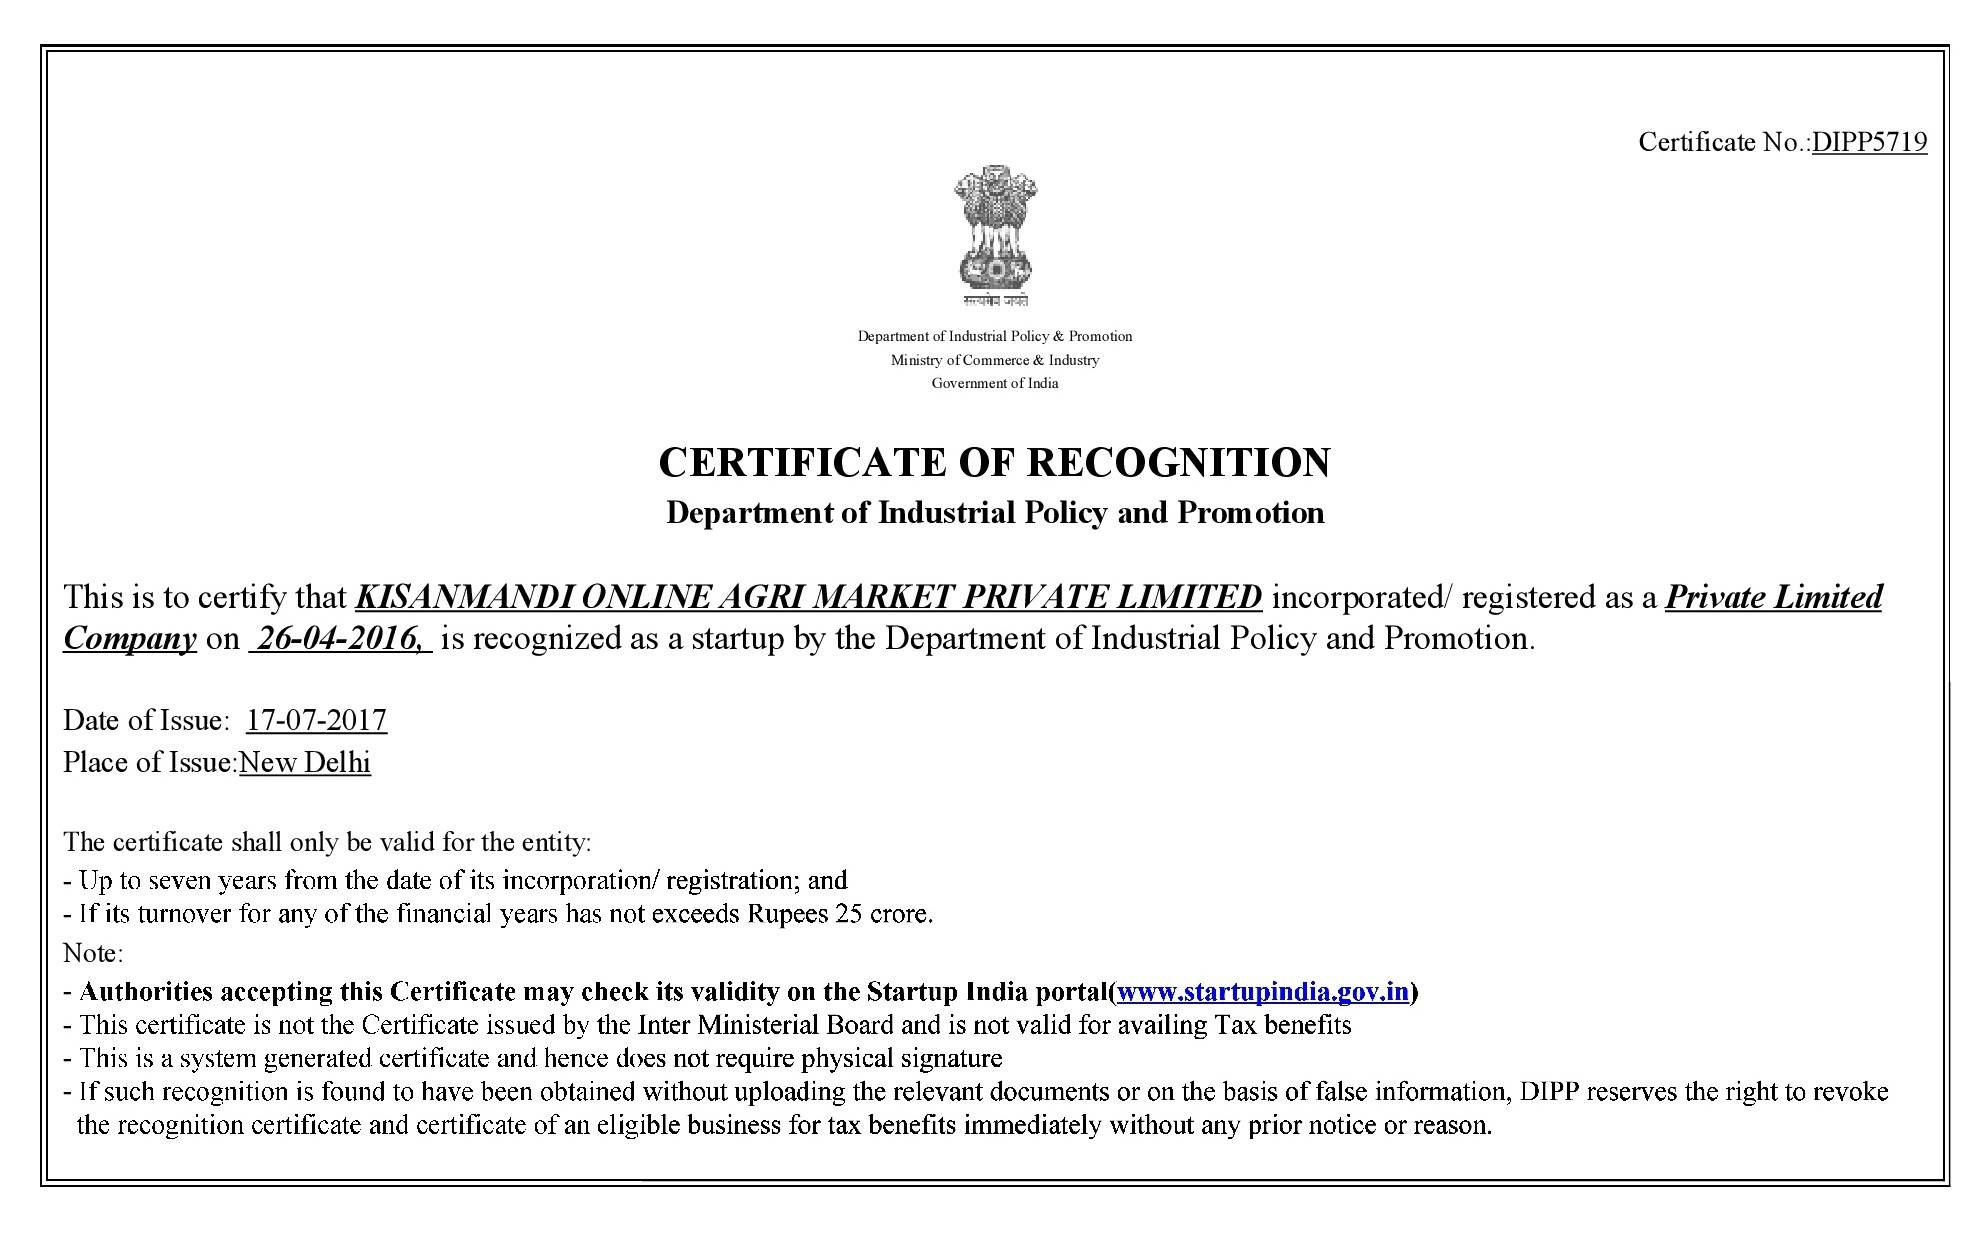 Kisan Mandi- Online Agri Market India